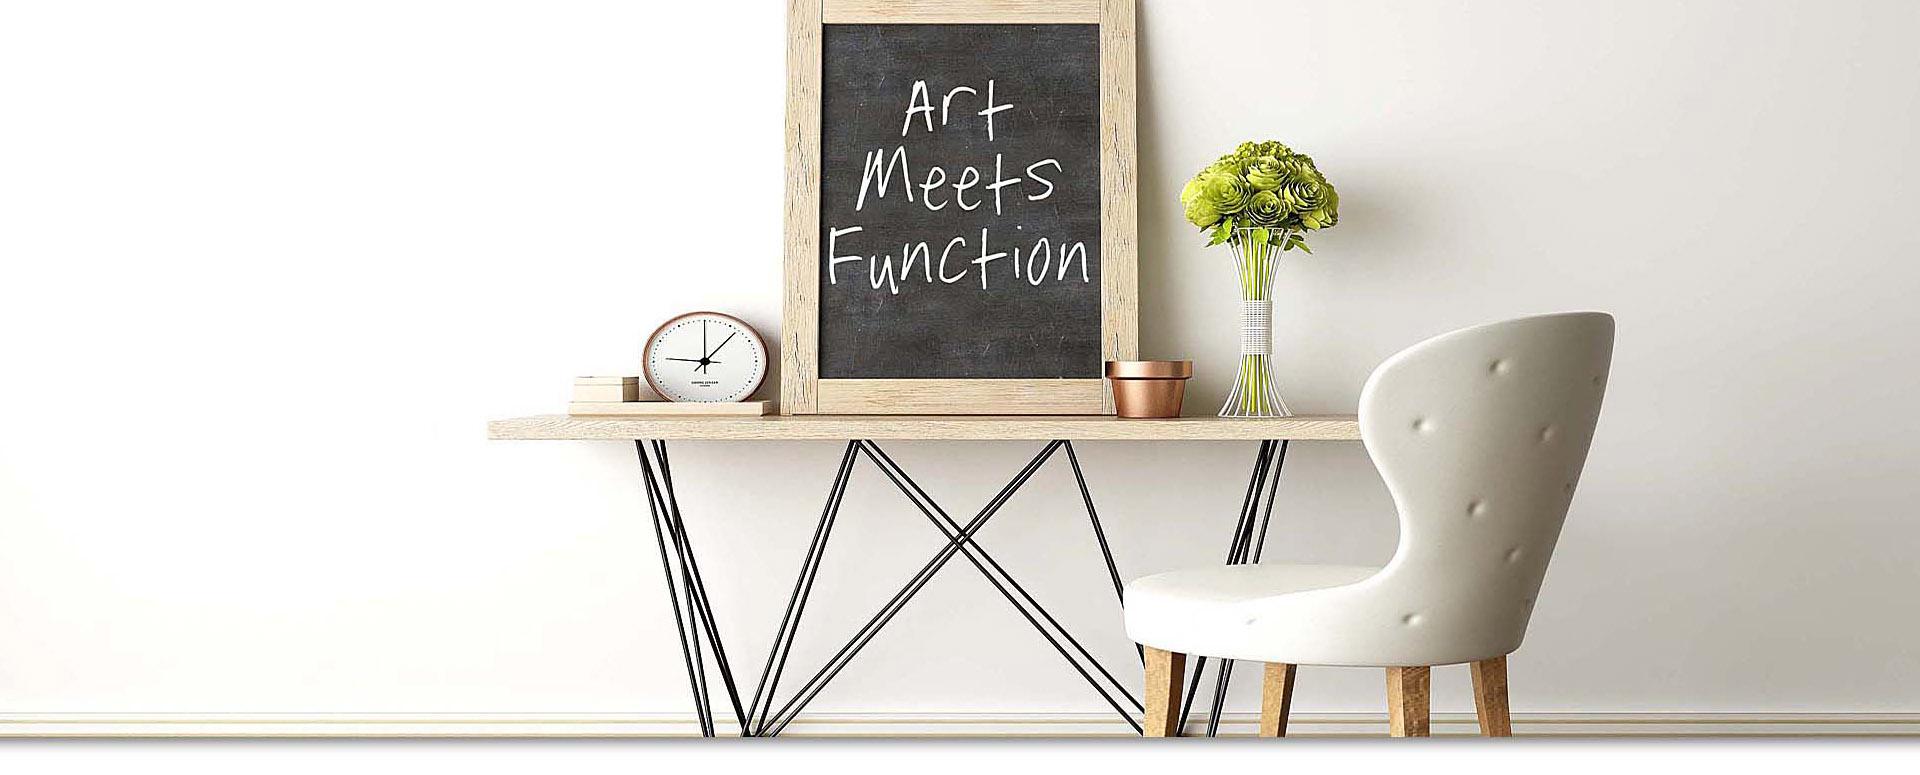 Gift Ideas from Ardstrum